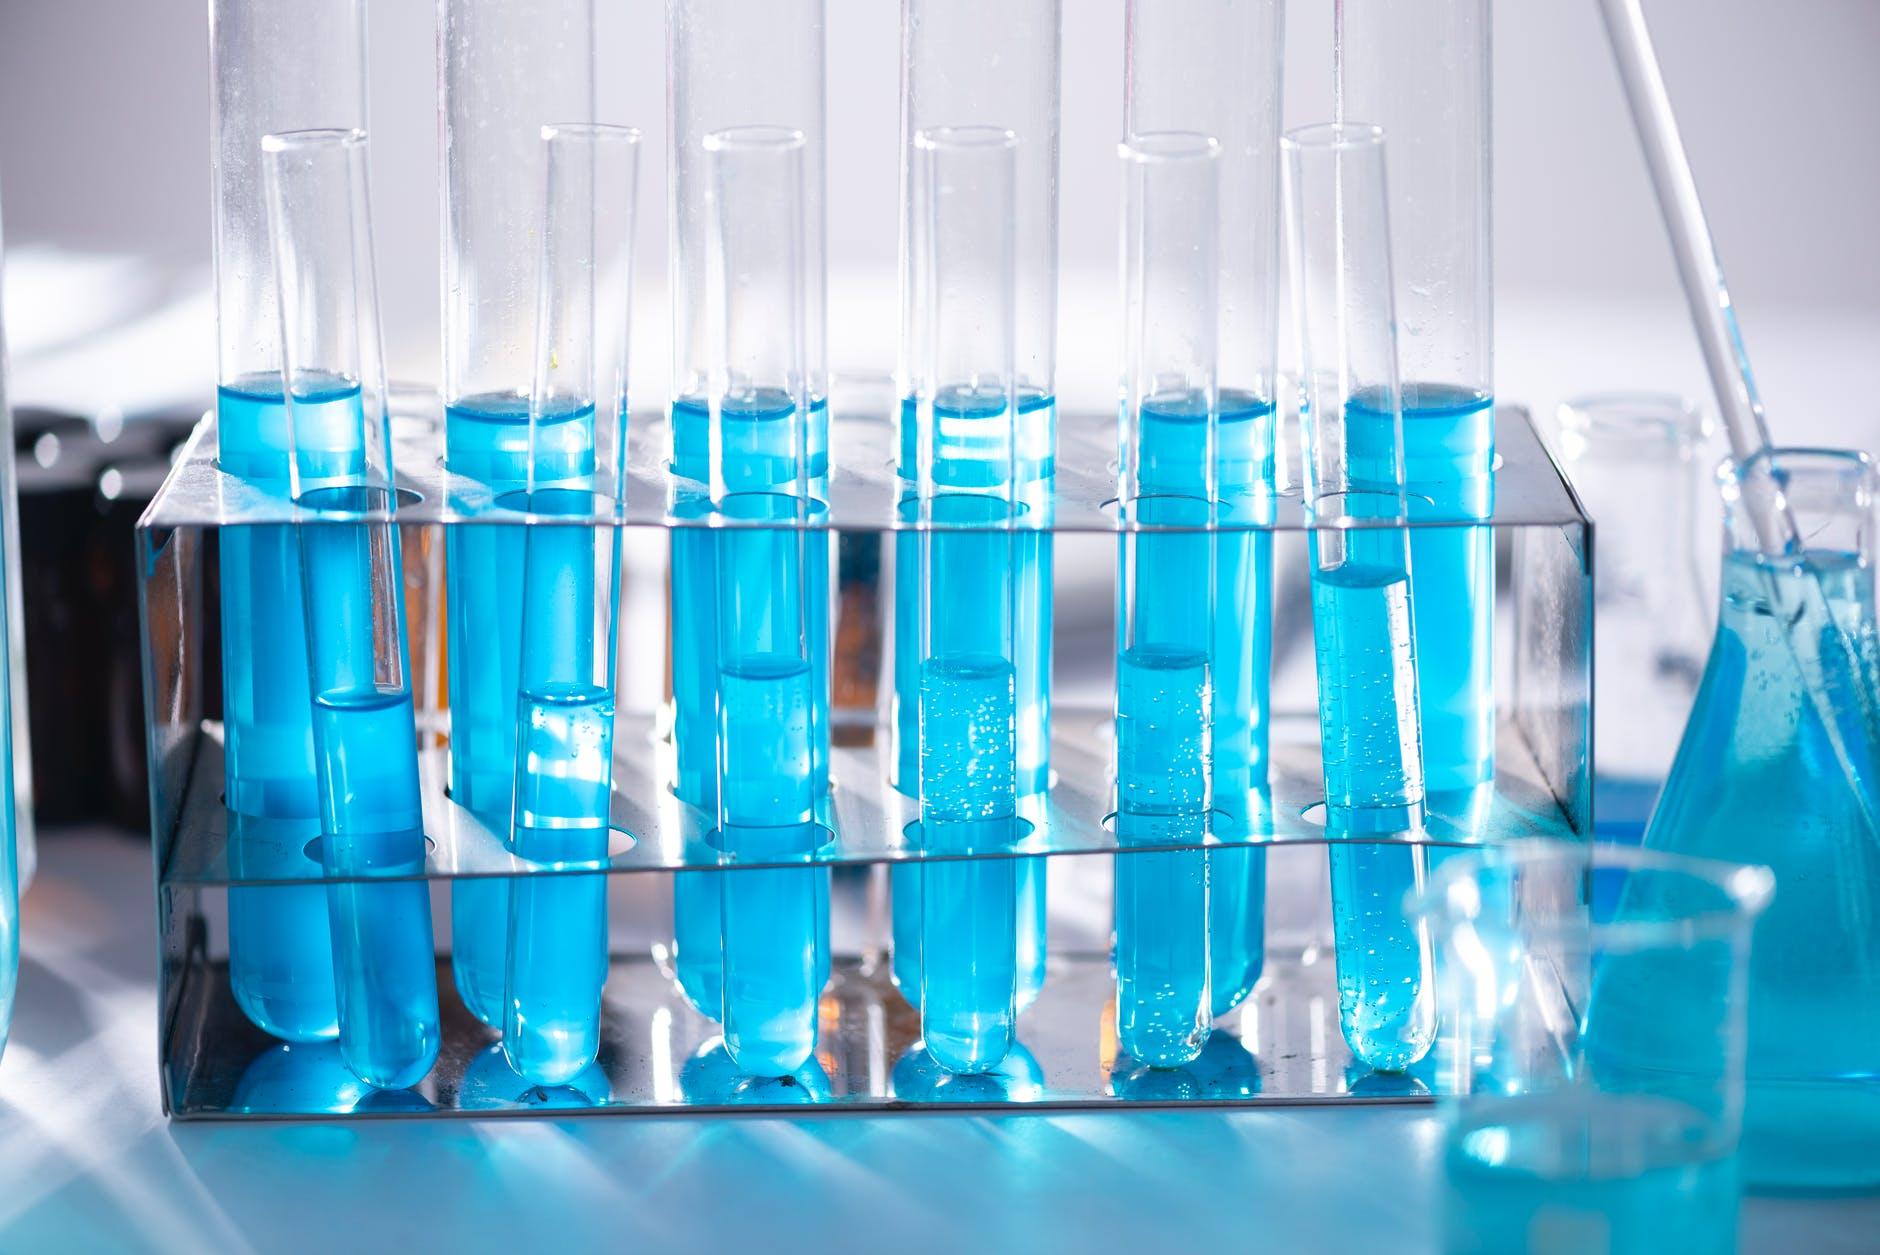 Alege un producator cutie izoterma pentru ca serul fiziologic sa ajunga cu bine in farmacii